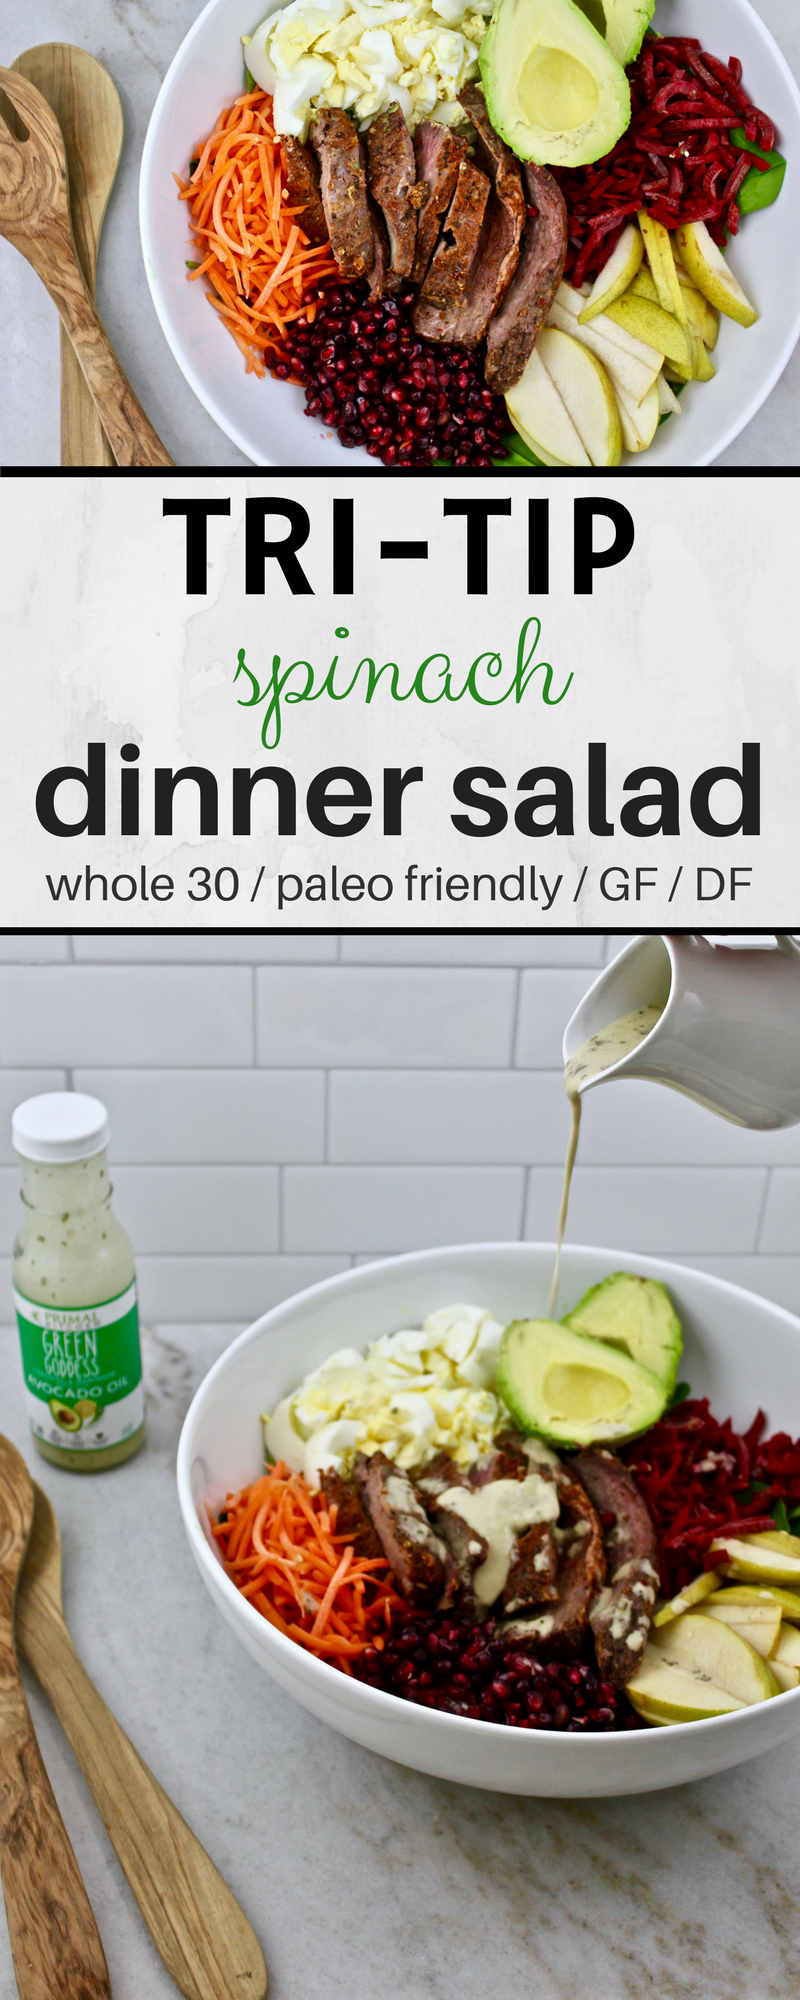 Tri-tip Spinach Salad with Primal Kitchen Green Goddess Dressing ...